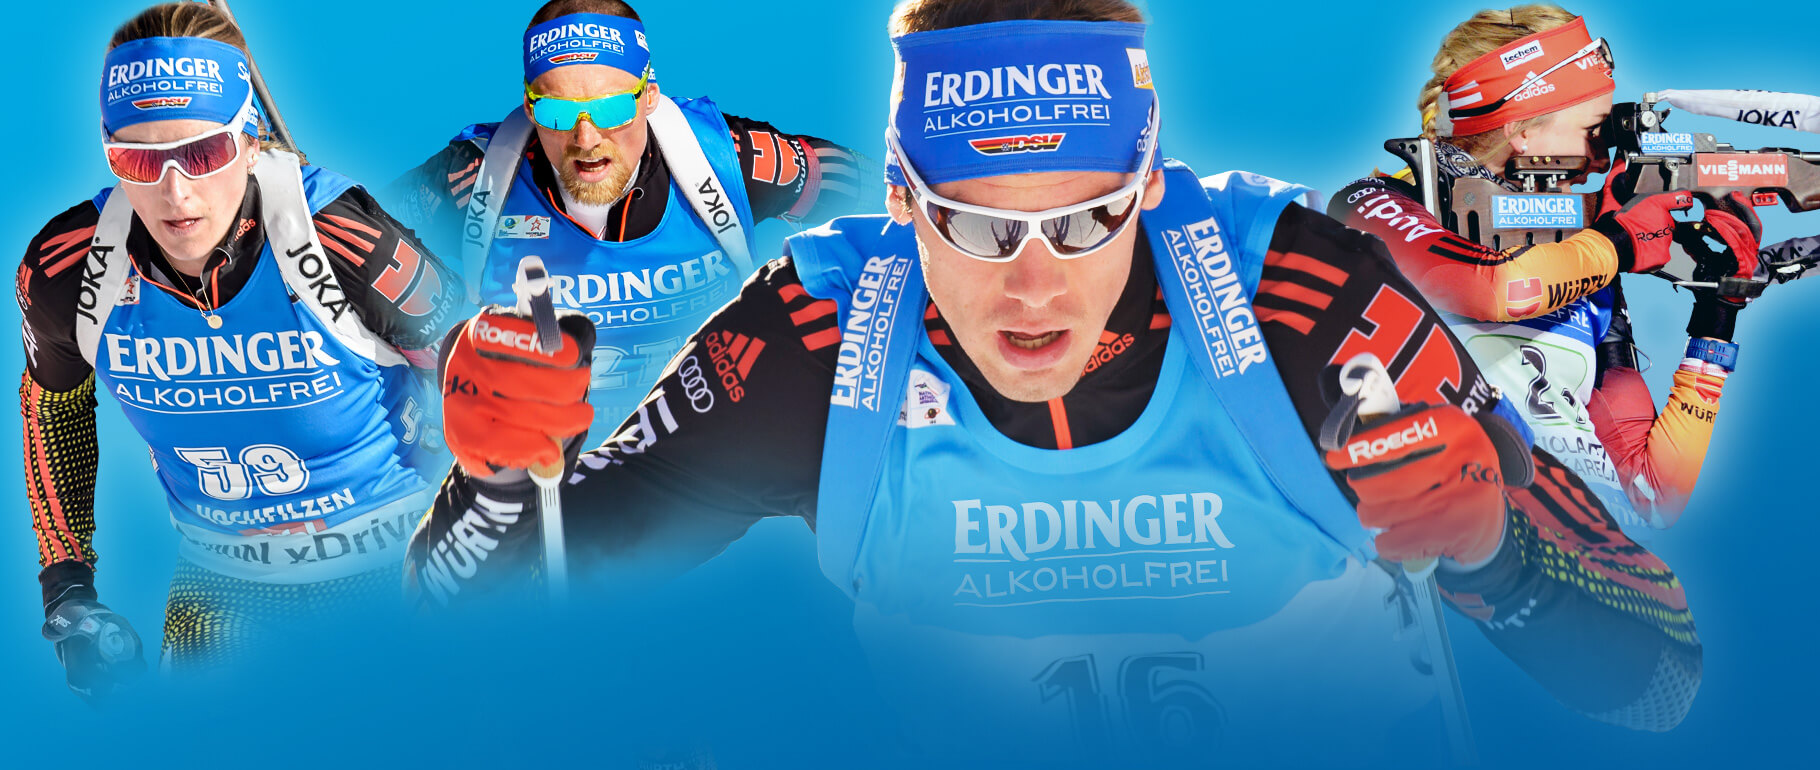 Biathlon mit ERDINGER Alkoholfrei!